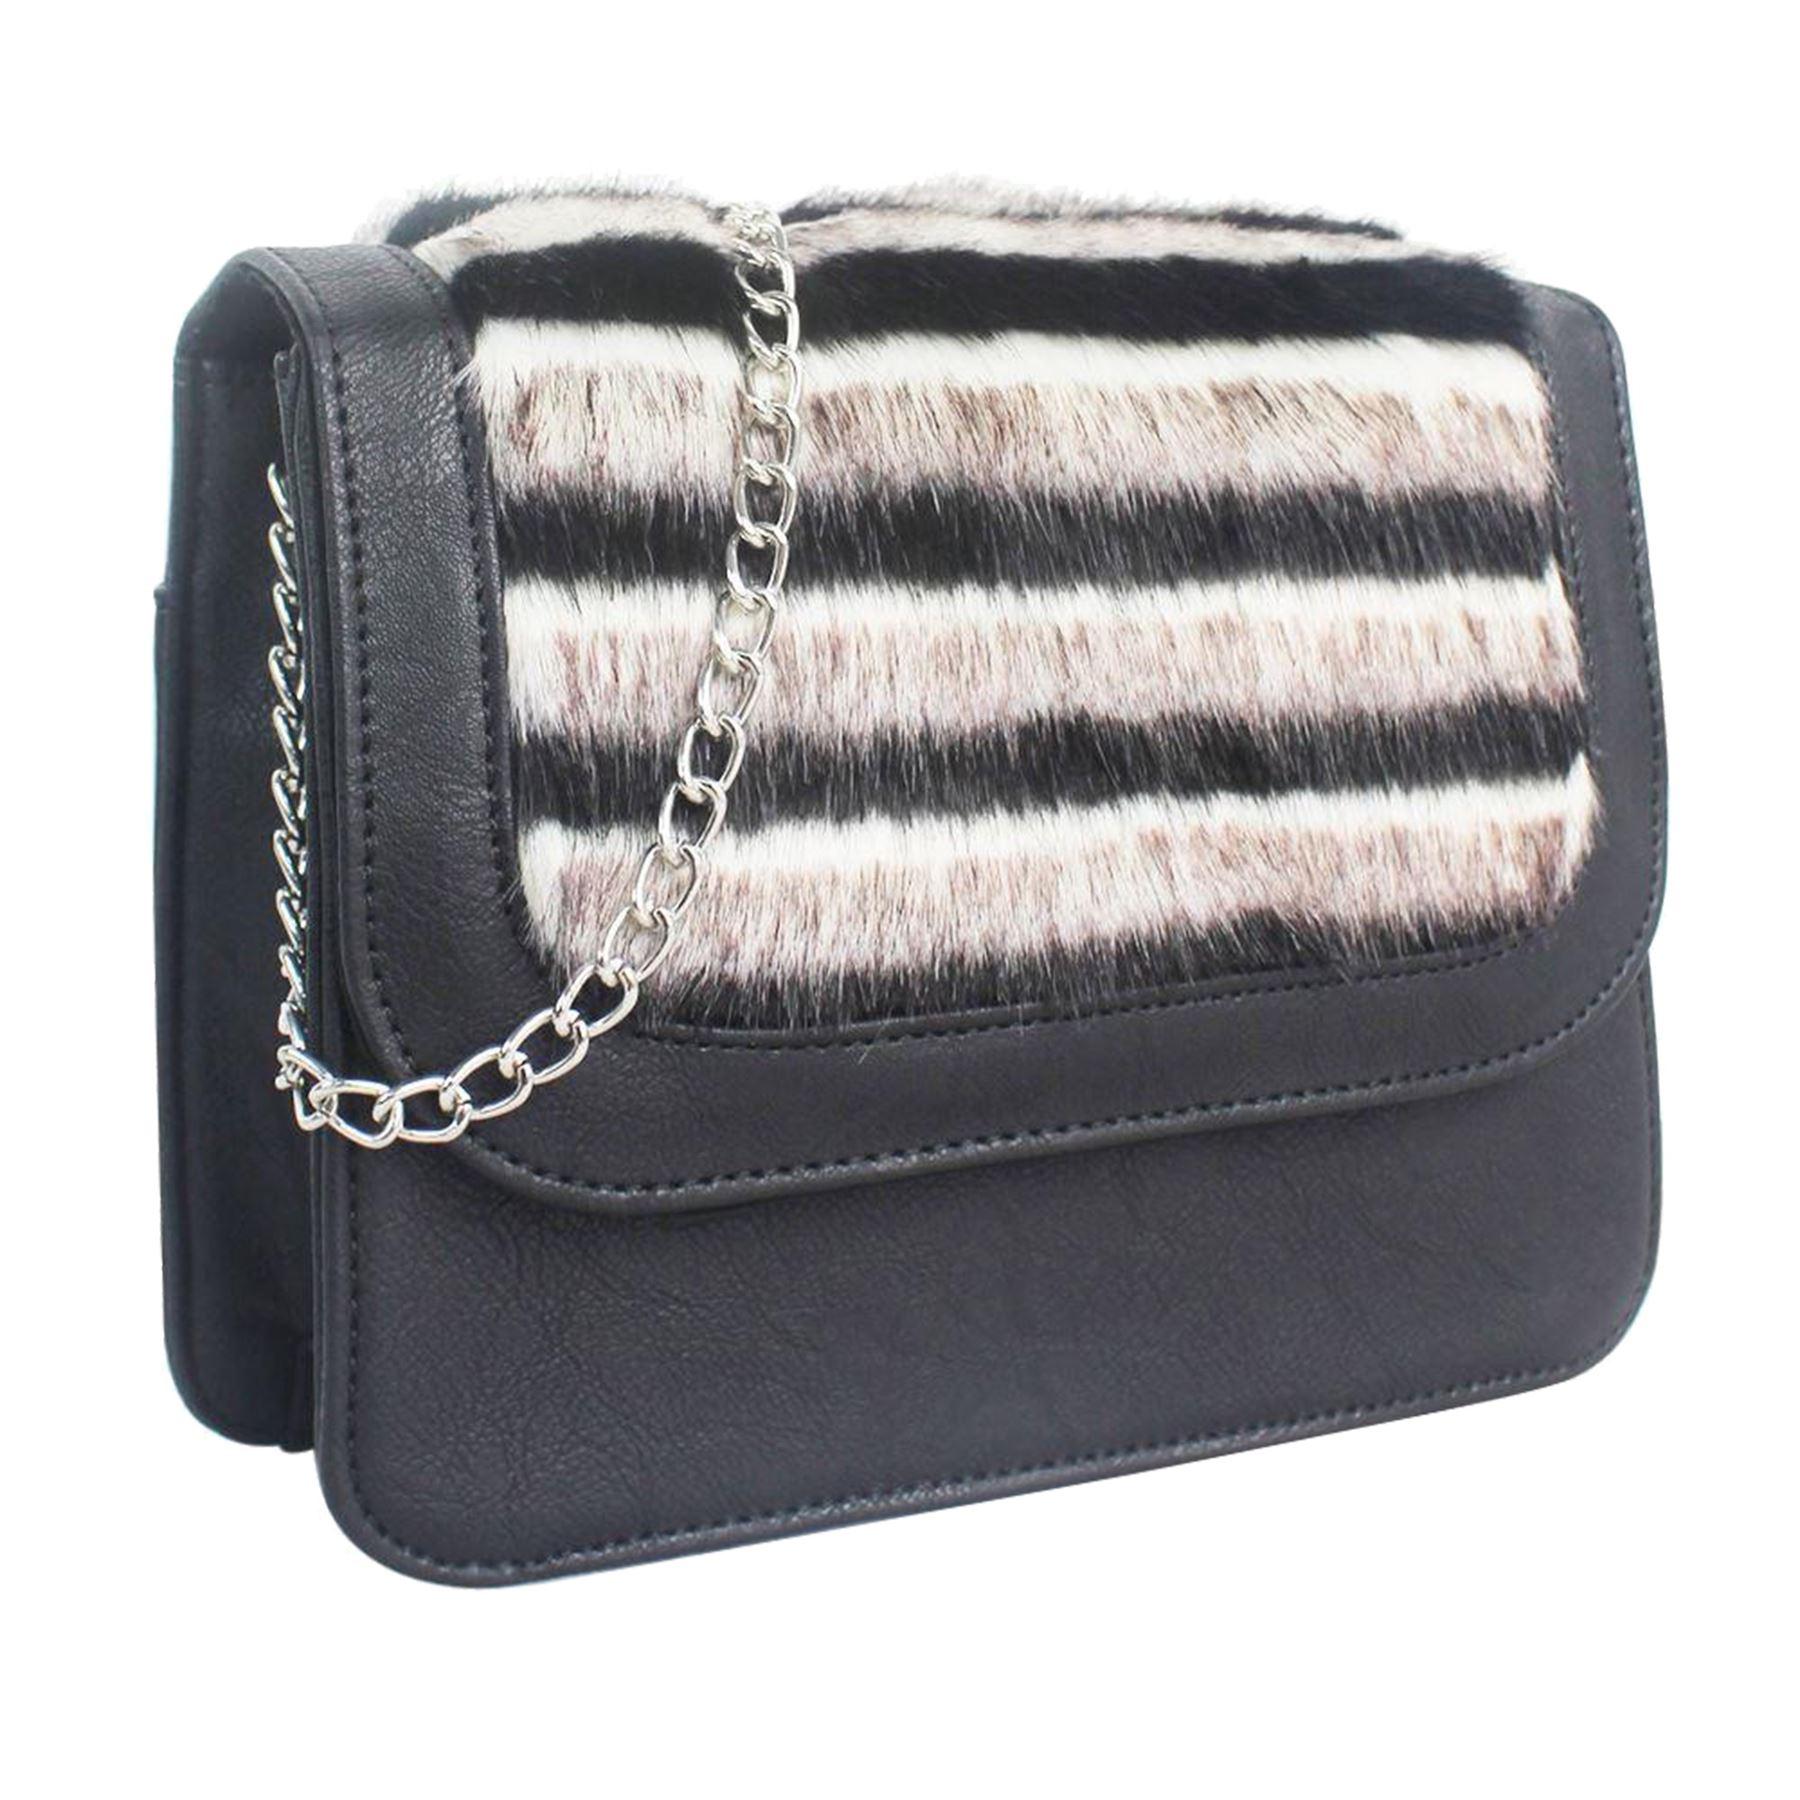 Handbag New Shoulder beige Faux Ladies Nero Silver Leather bordeaux nero nero Fur Chain Panel qxZ8wSqBr